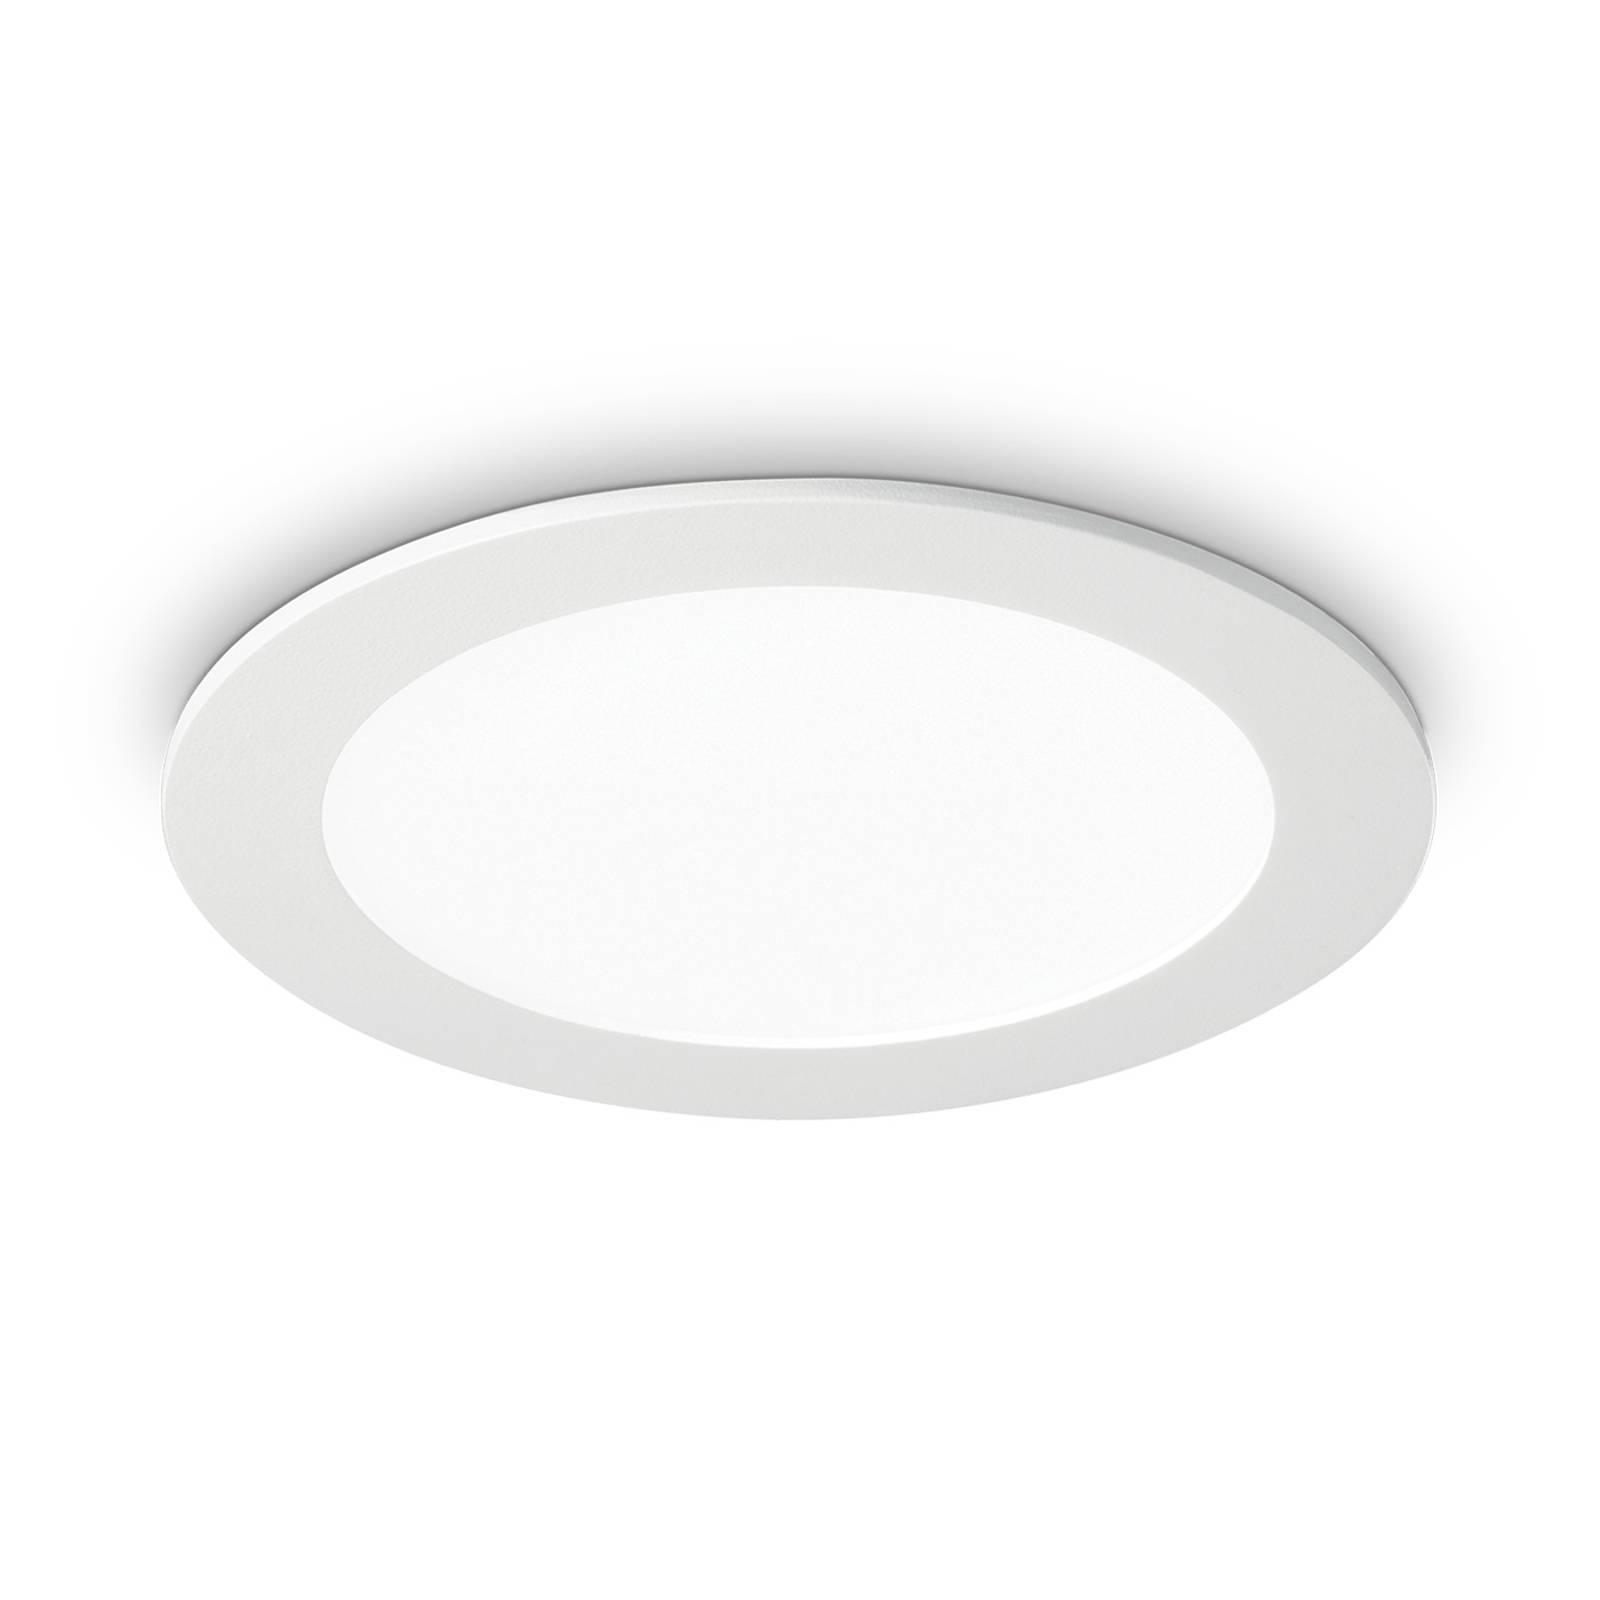 LED-kattouppovalaisin Groove round 3 000 K, 16,8cm